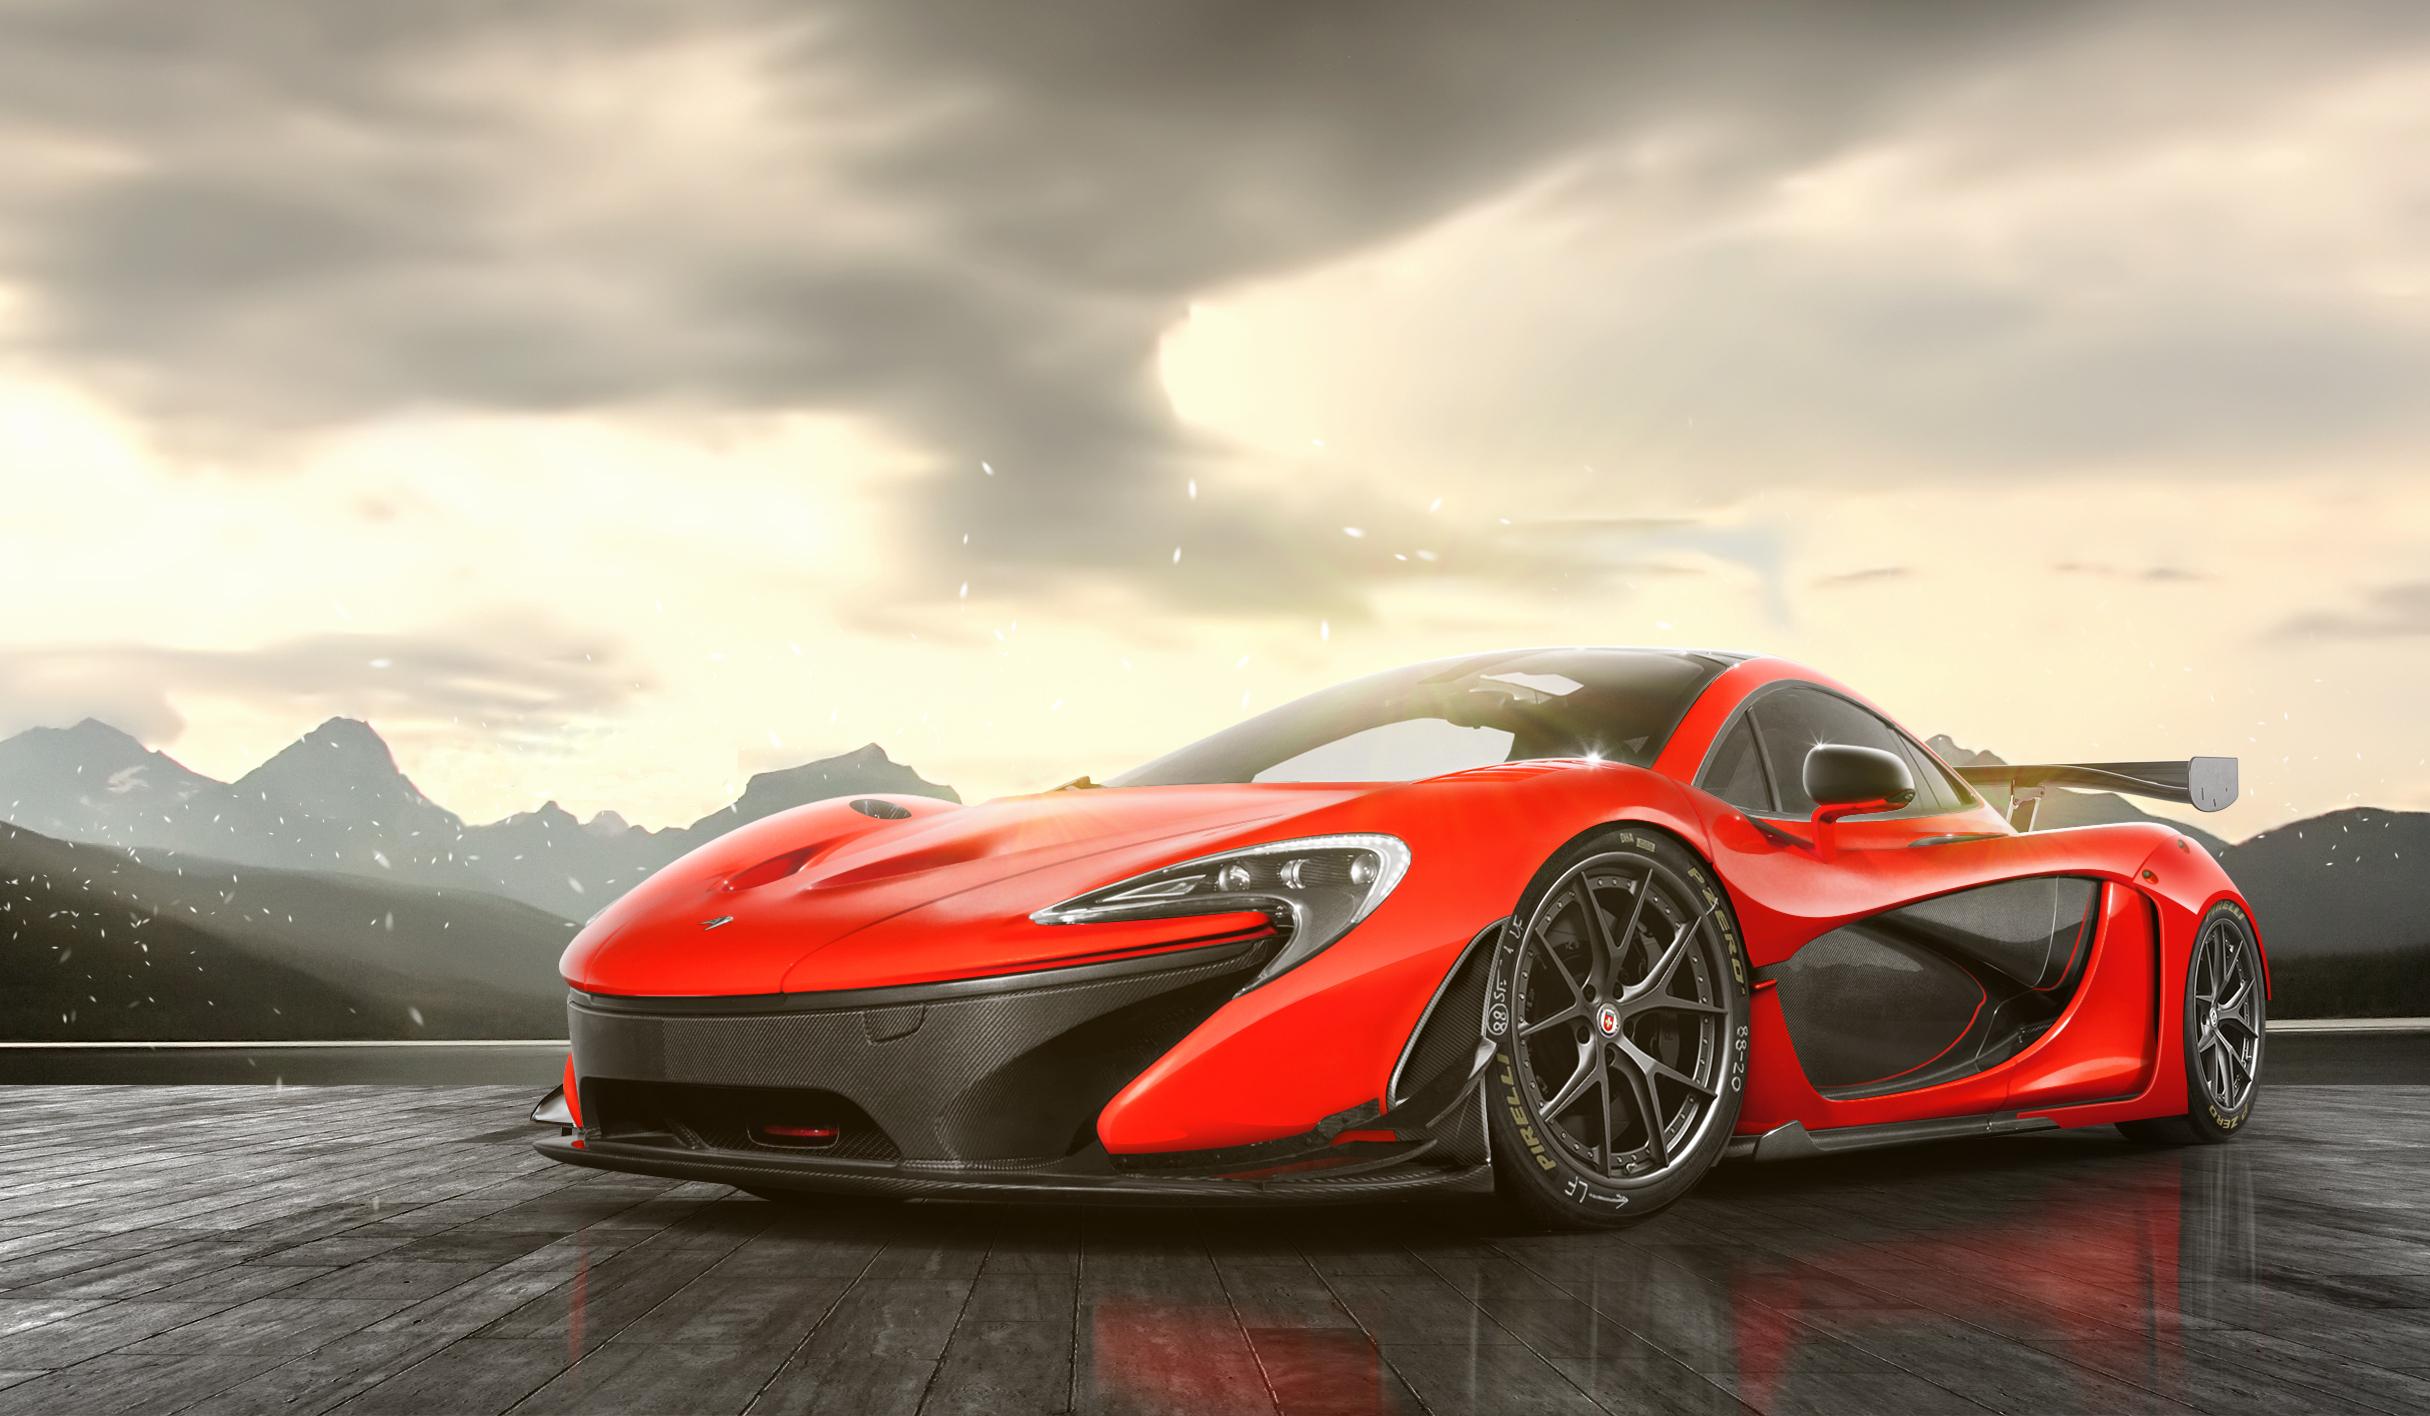 McLaren P1 Full HD Wallpaper and Background Image ...